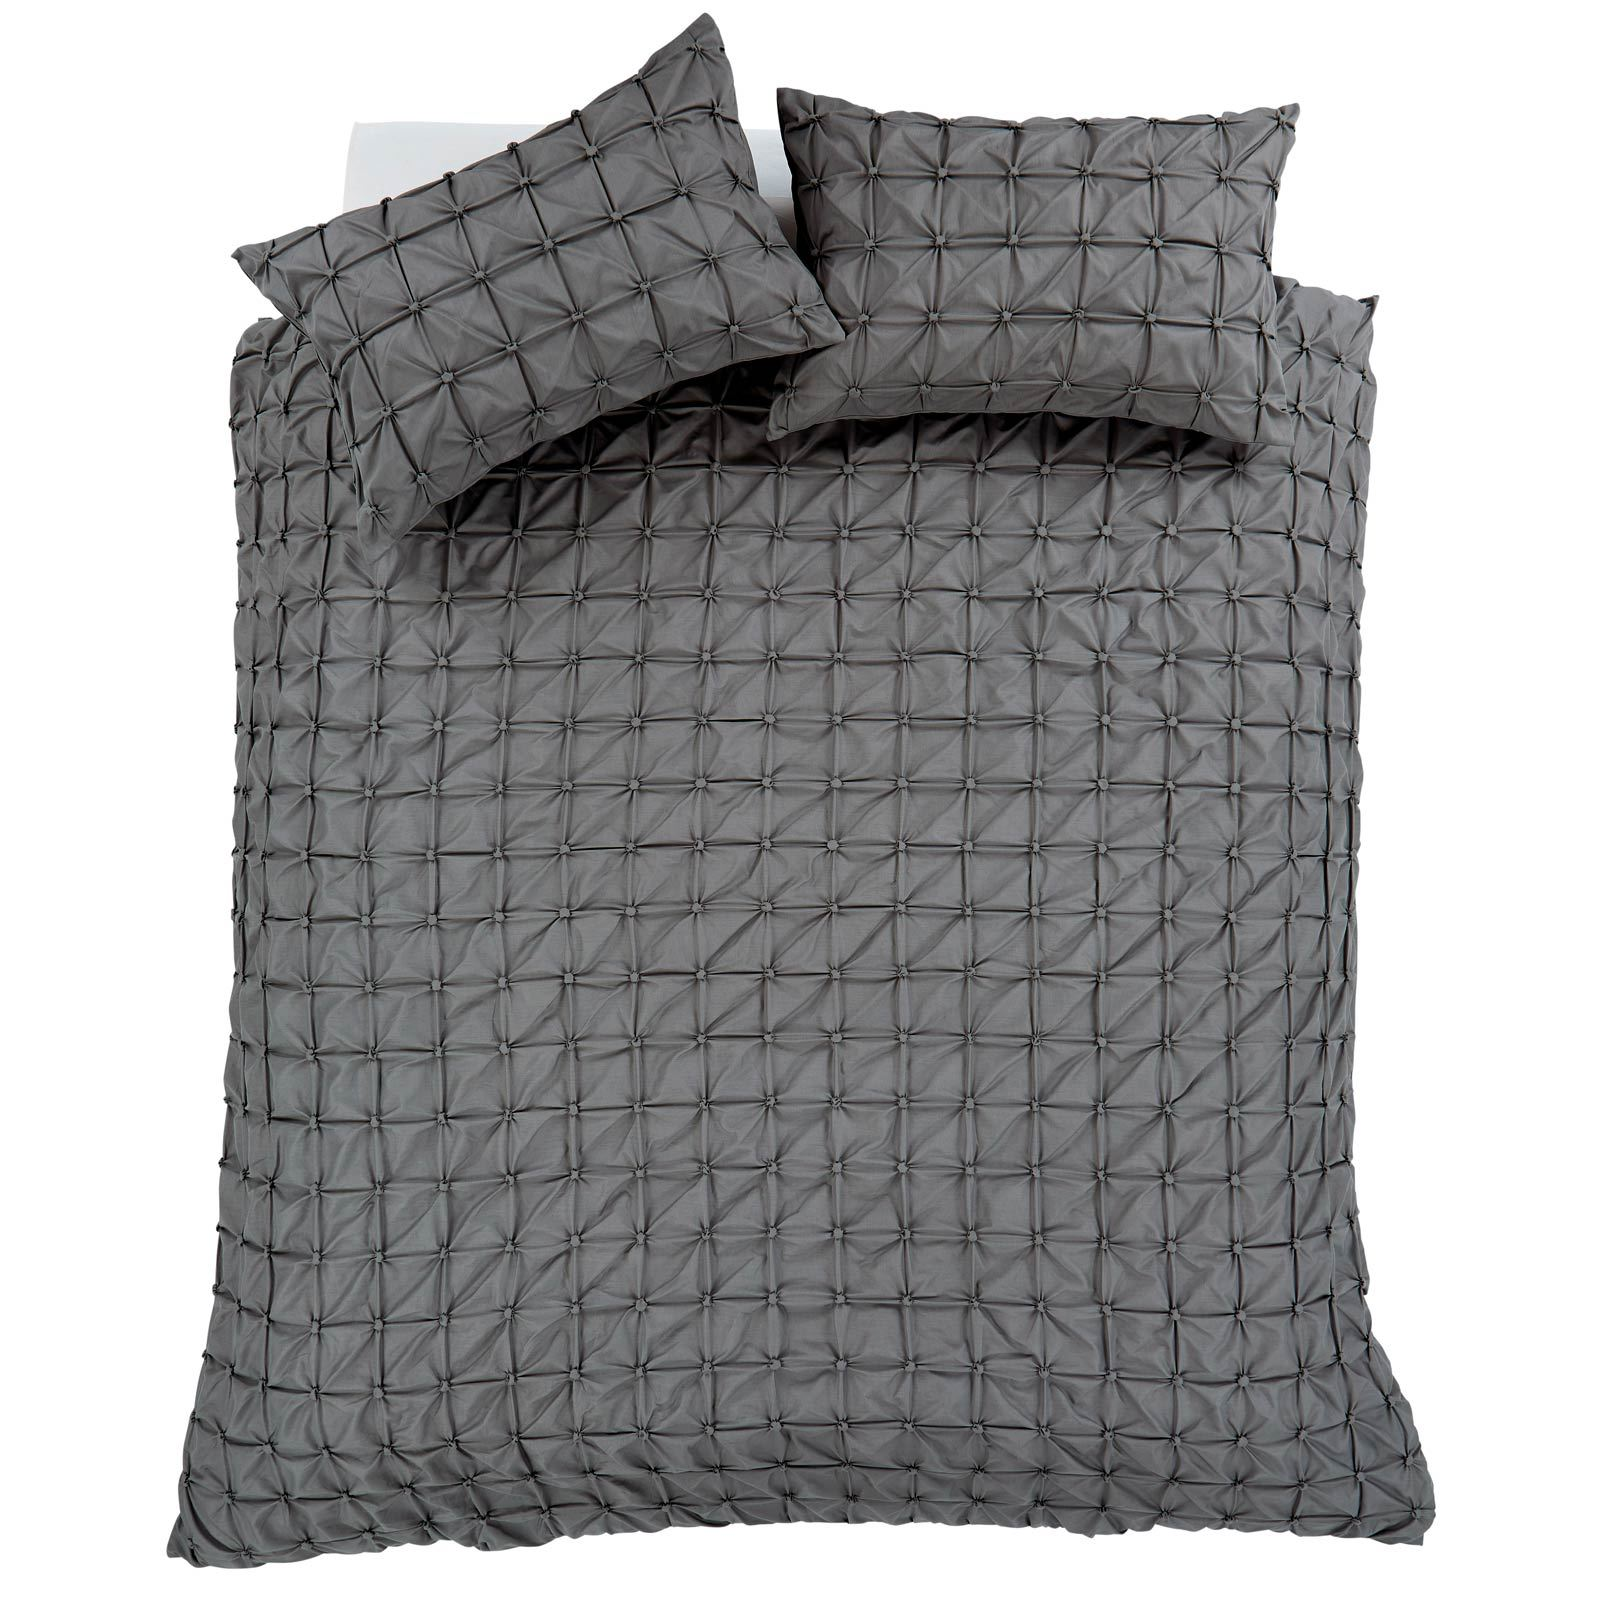 Pleated-Duvet-Covers-Seville-Pintuck-Luxury-Cotton-Rich-Quilt-Bedding-Sets thumbnail 5